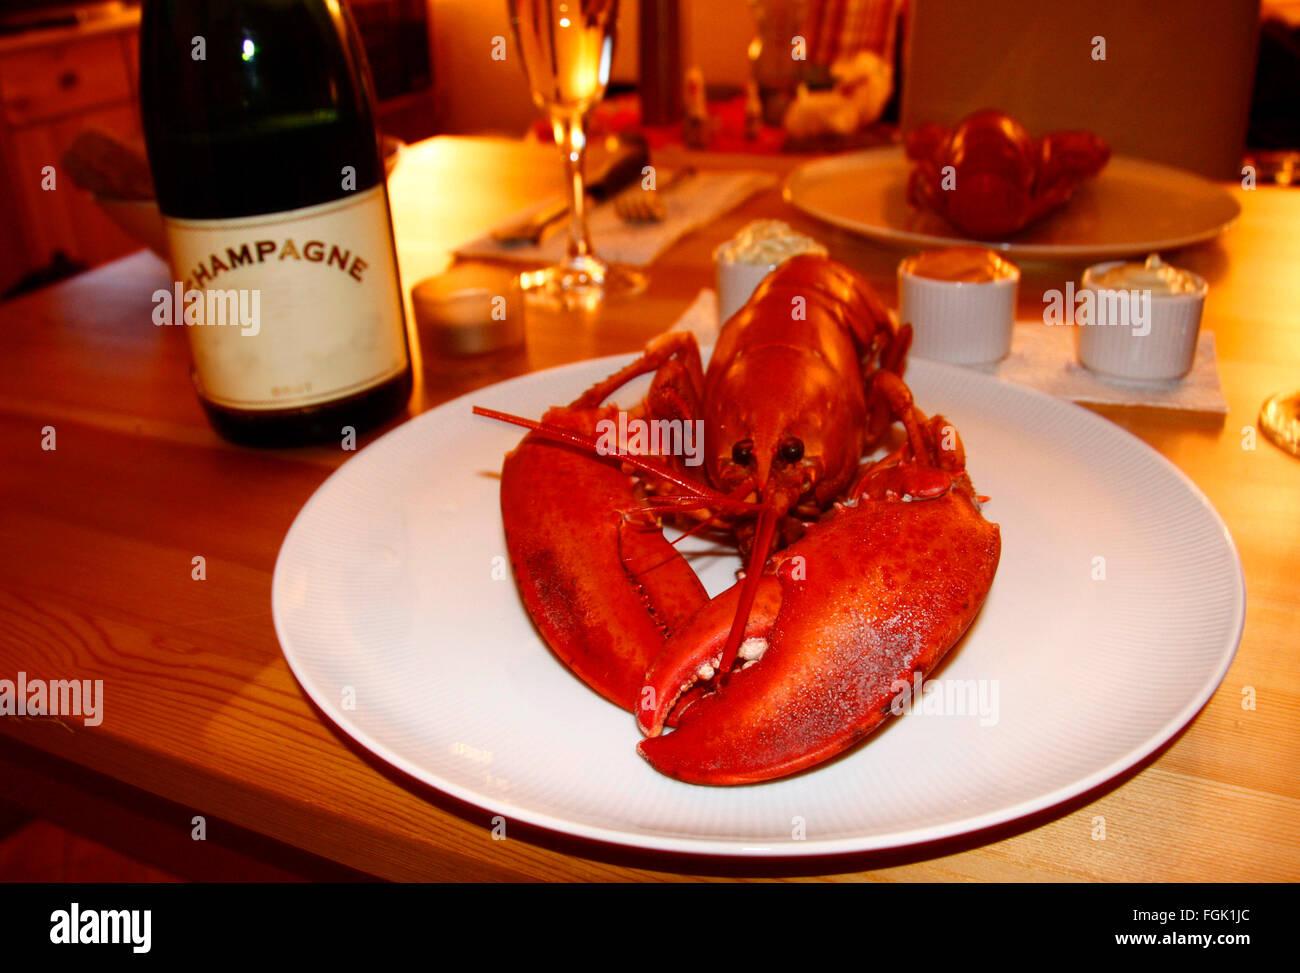 Champagner, Hummer. - Stock Image